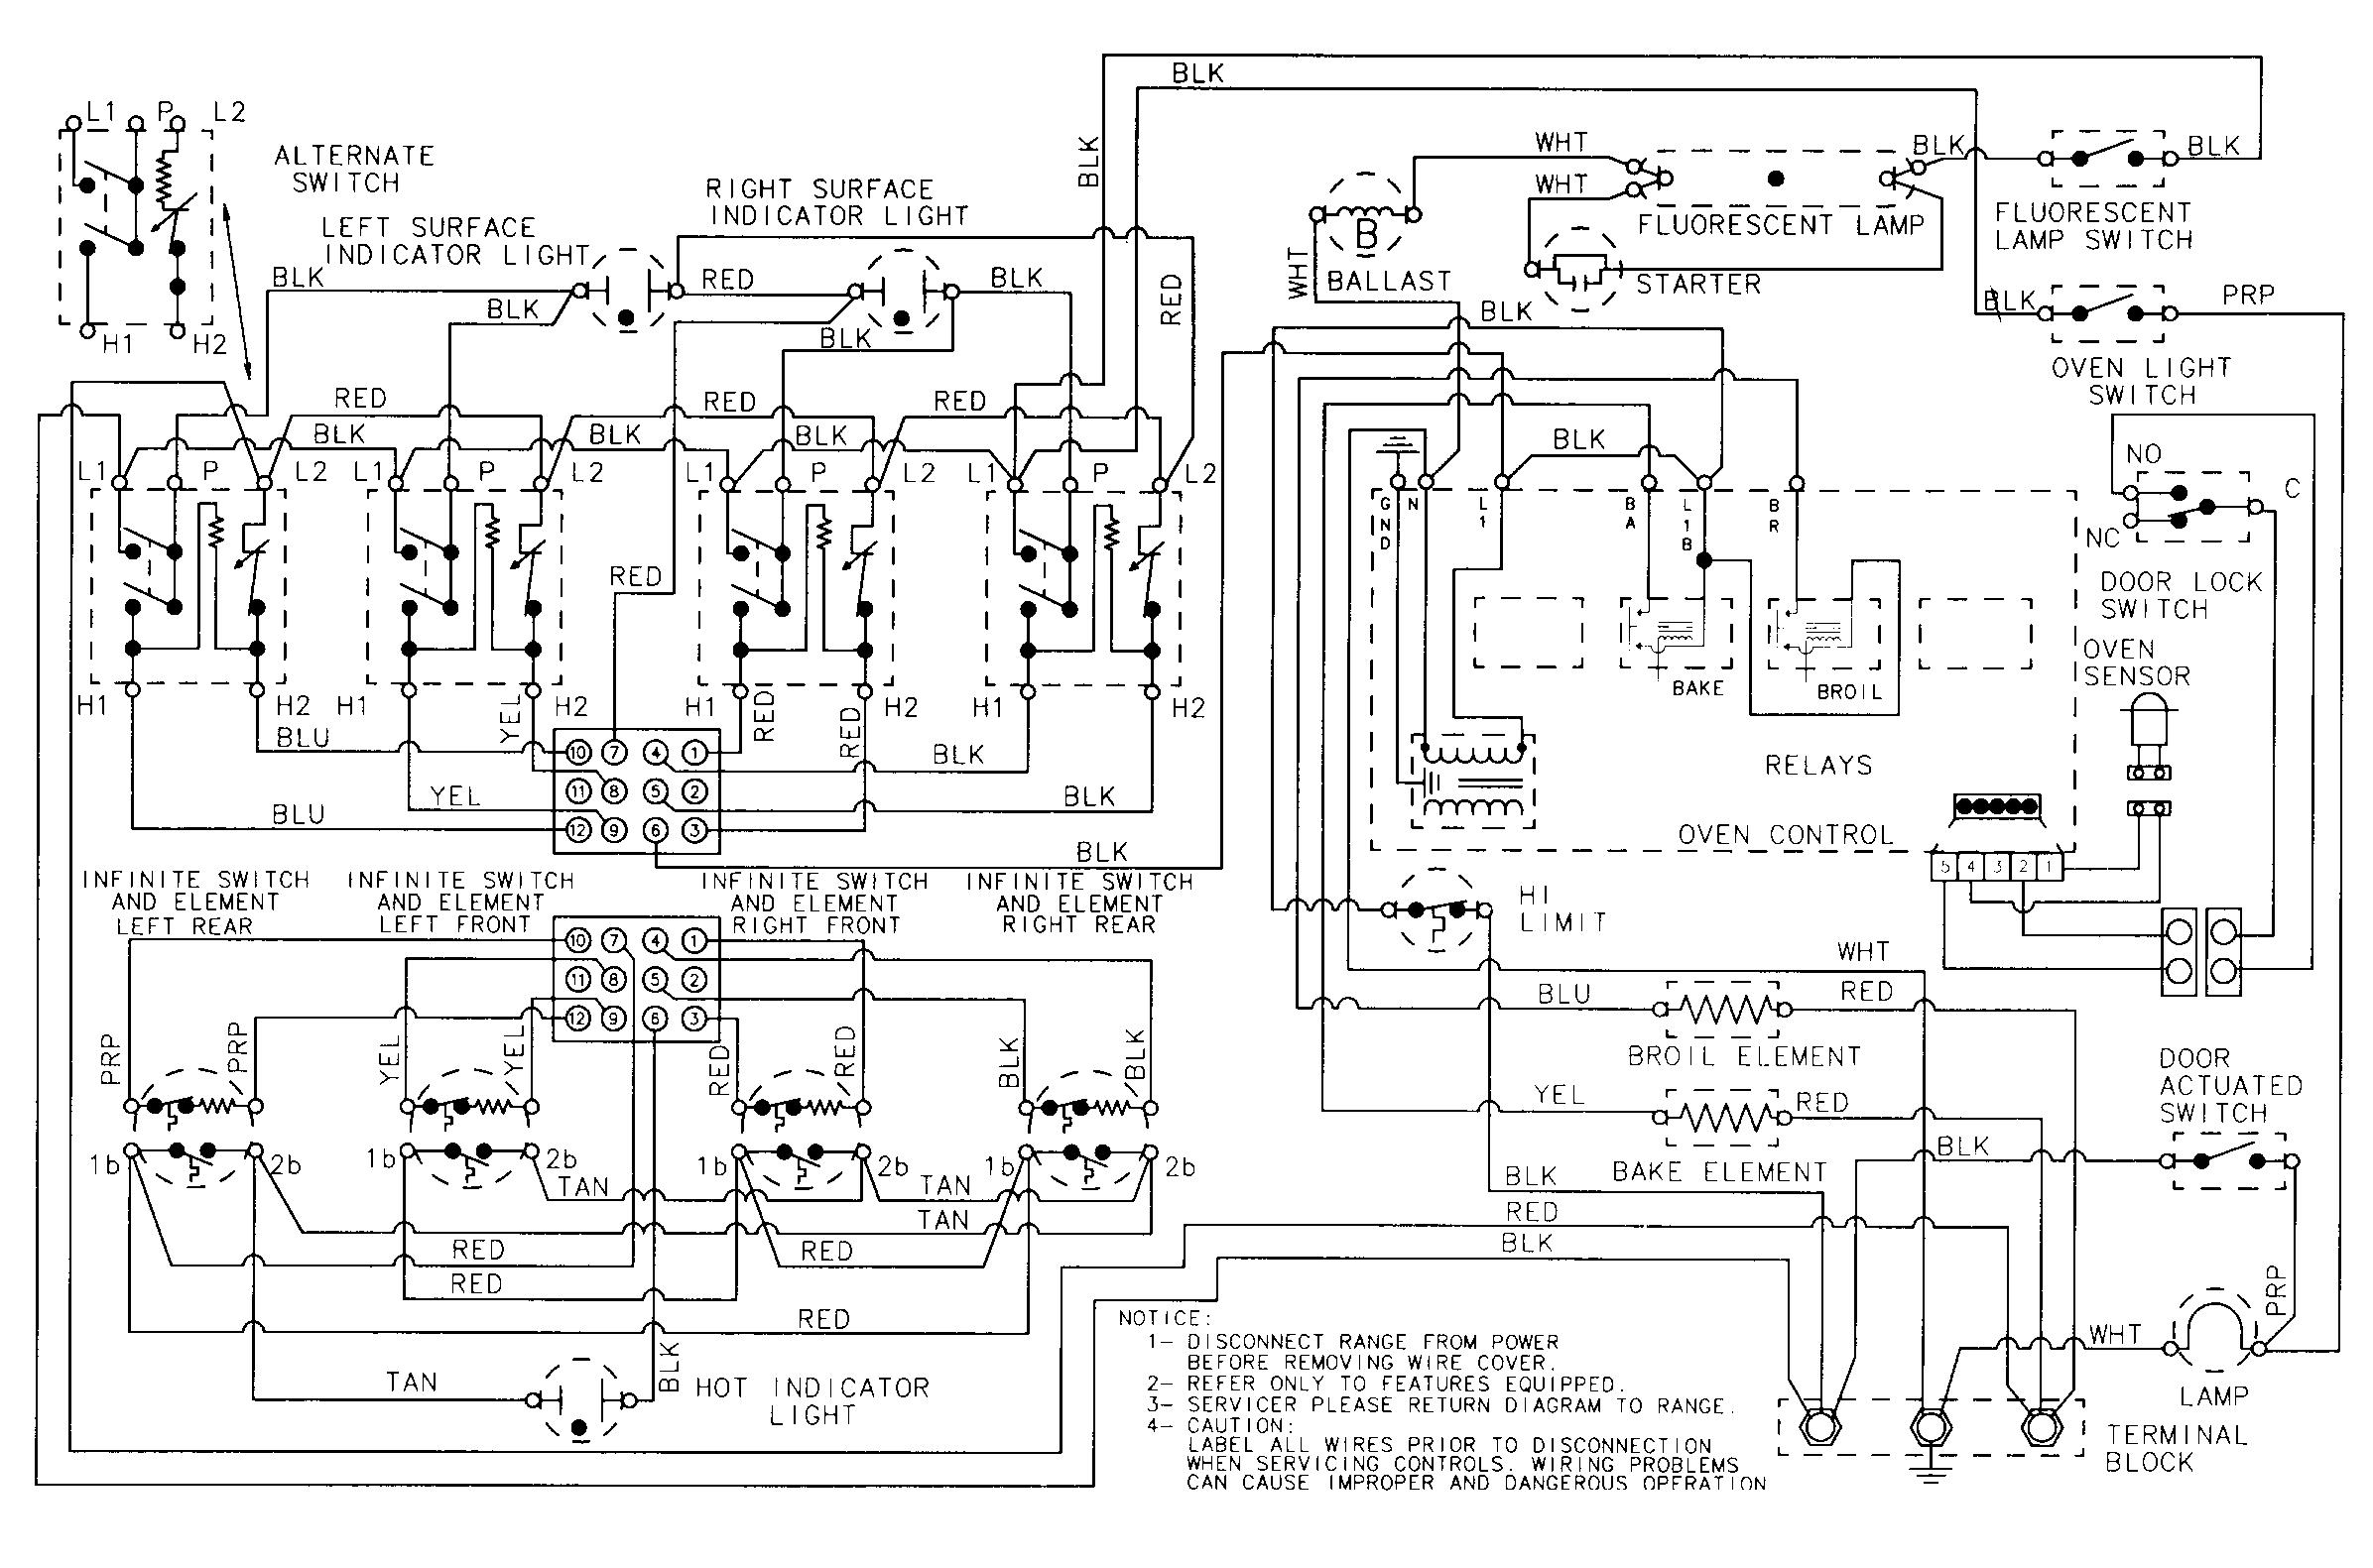 Whirlpool Gas Range Wiring Diagram Trusted Wiring Diagrams \u2022 Maytag  Washer Wiring Diagrams Whirlpool Cooktop Wiring Diagrams